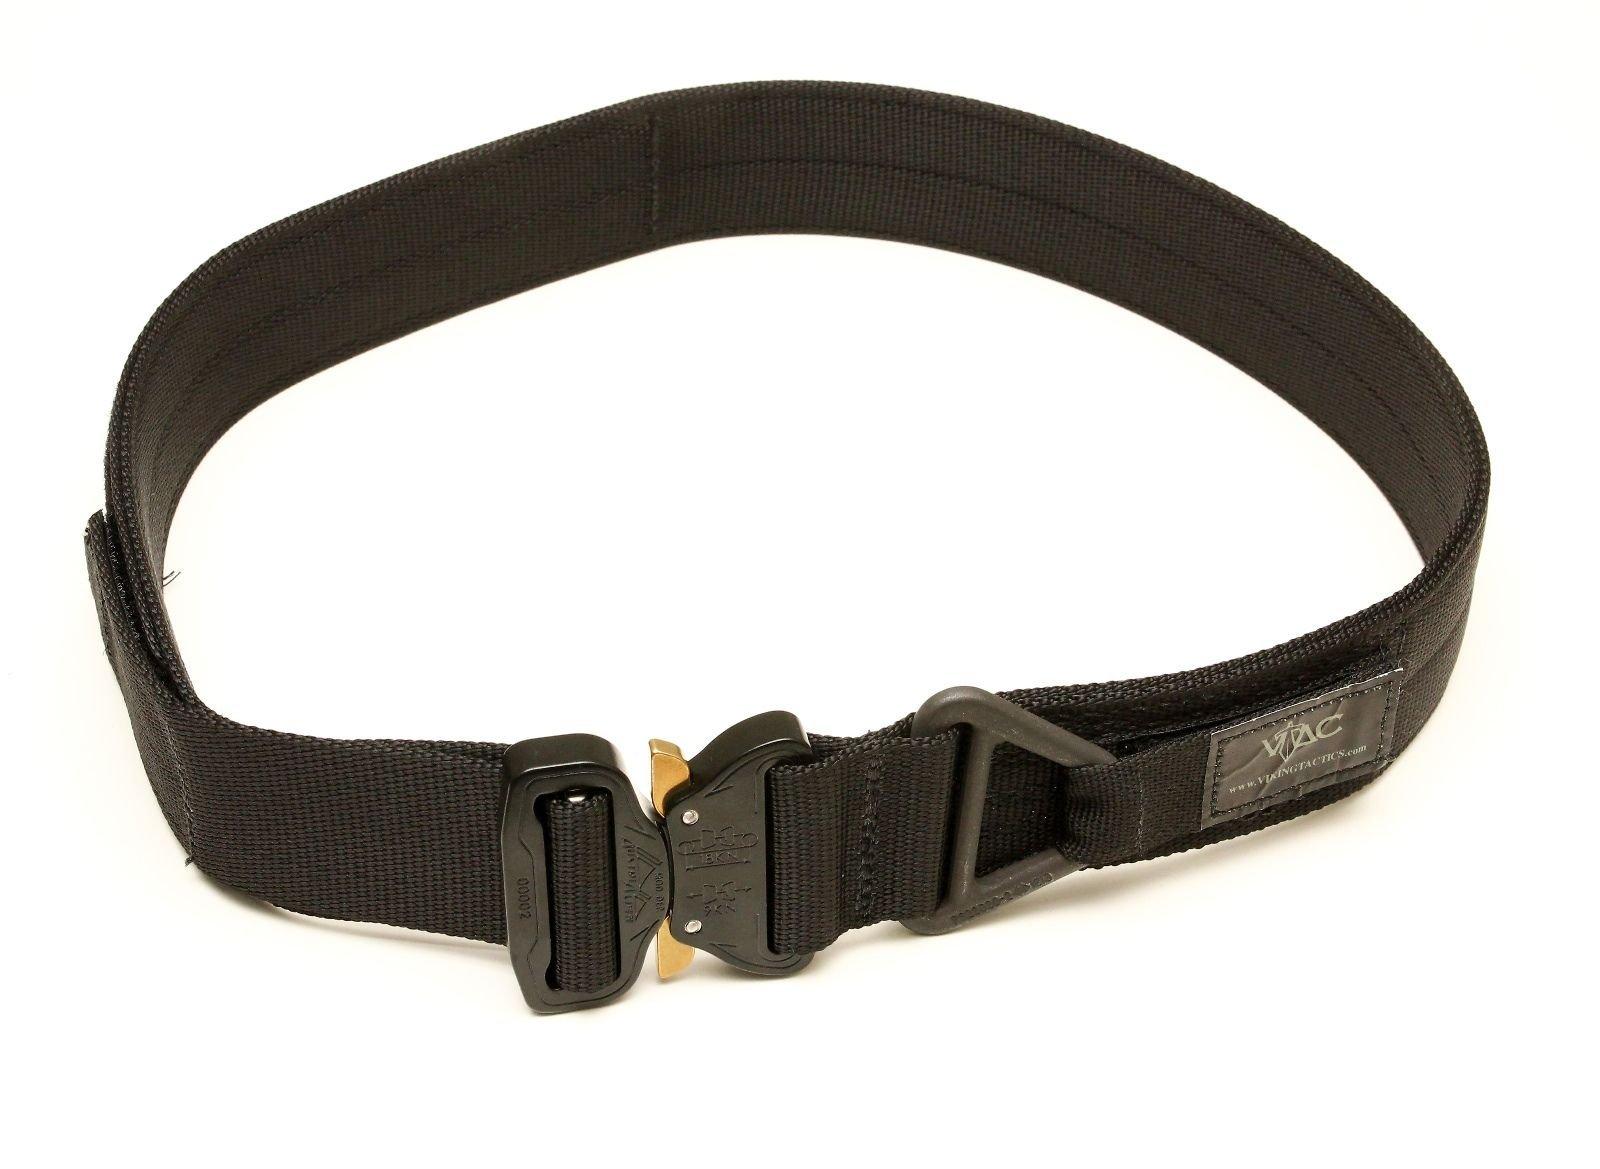 VTAC Cobra Riggers Belt w/AustriAlpin Brand Cobra Buckle & Triangular D-Ring